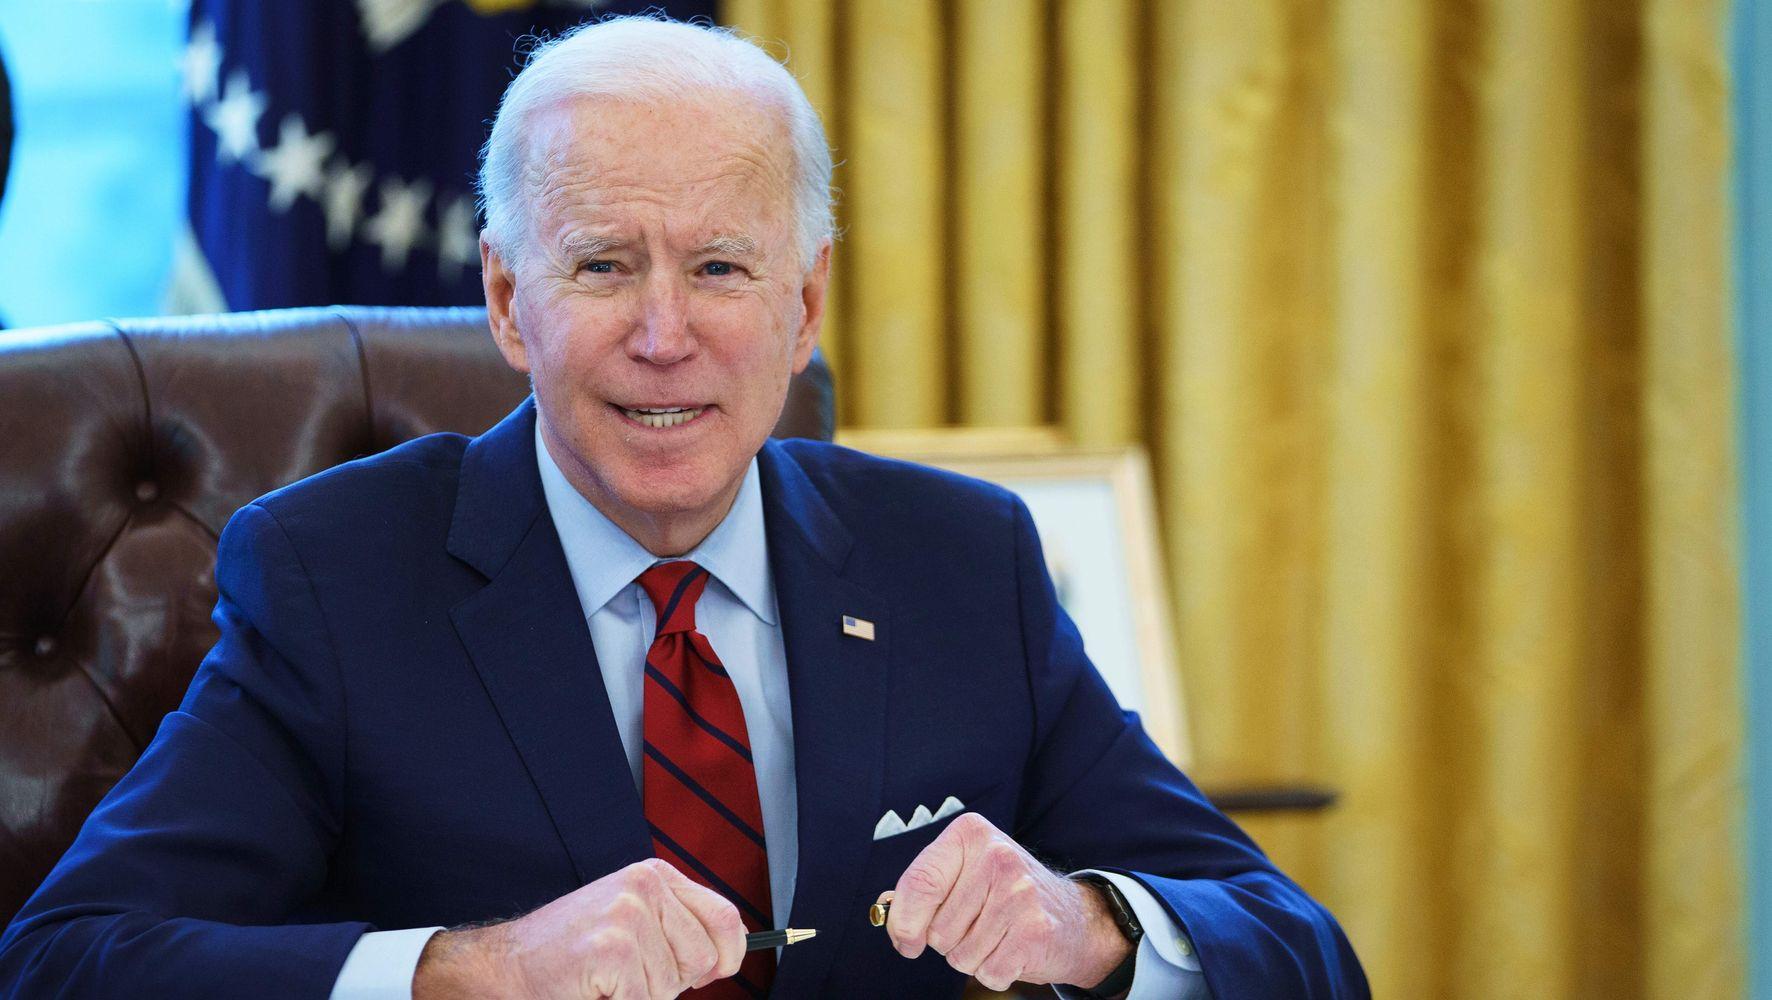 Biden Stays Clear Of Endorsing Union Effort At Alabama Amazon Warehouse